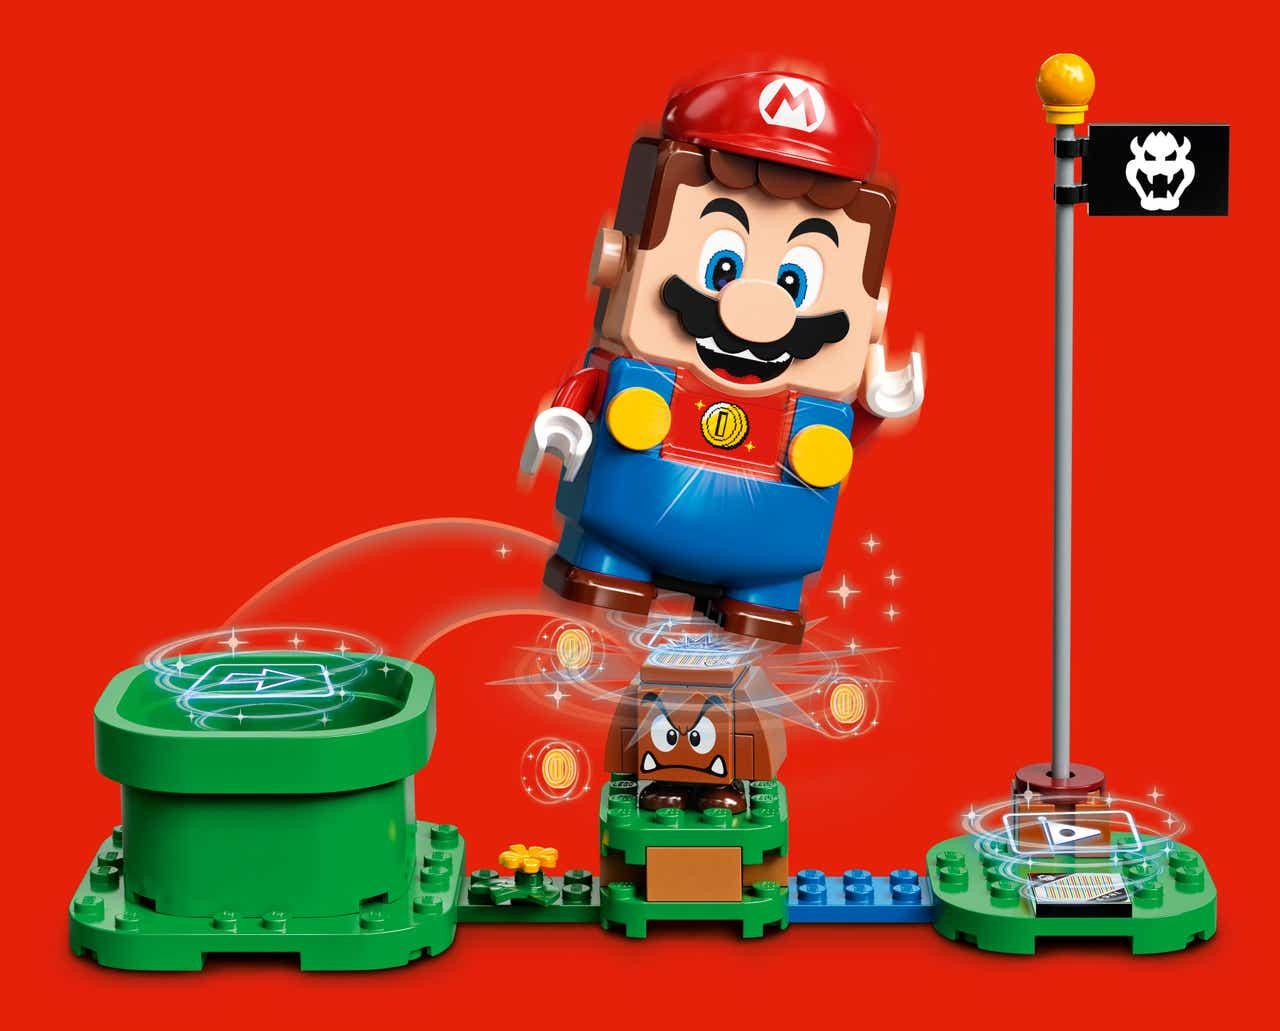 Mario prod